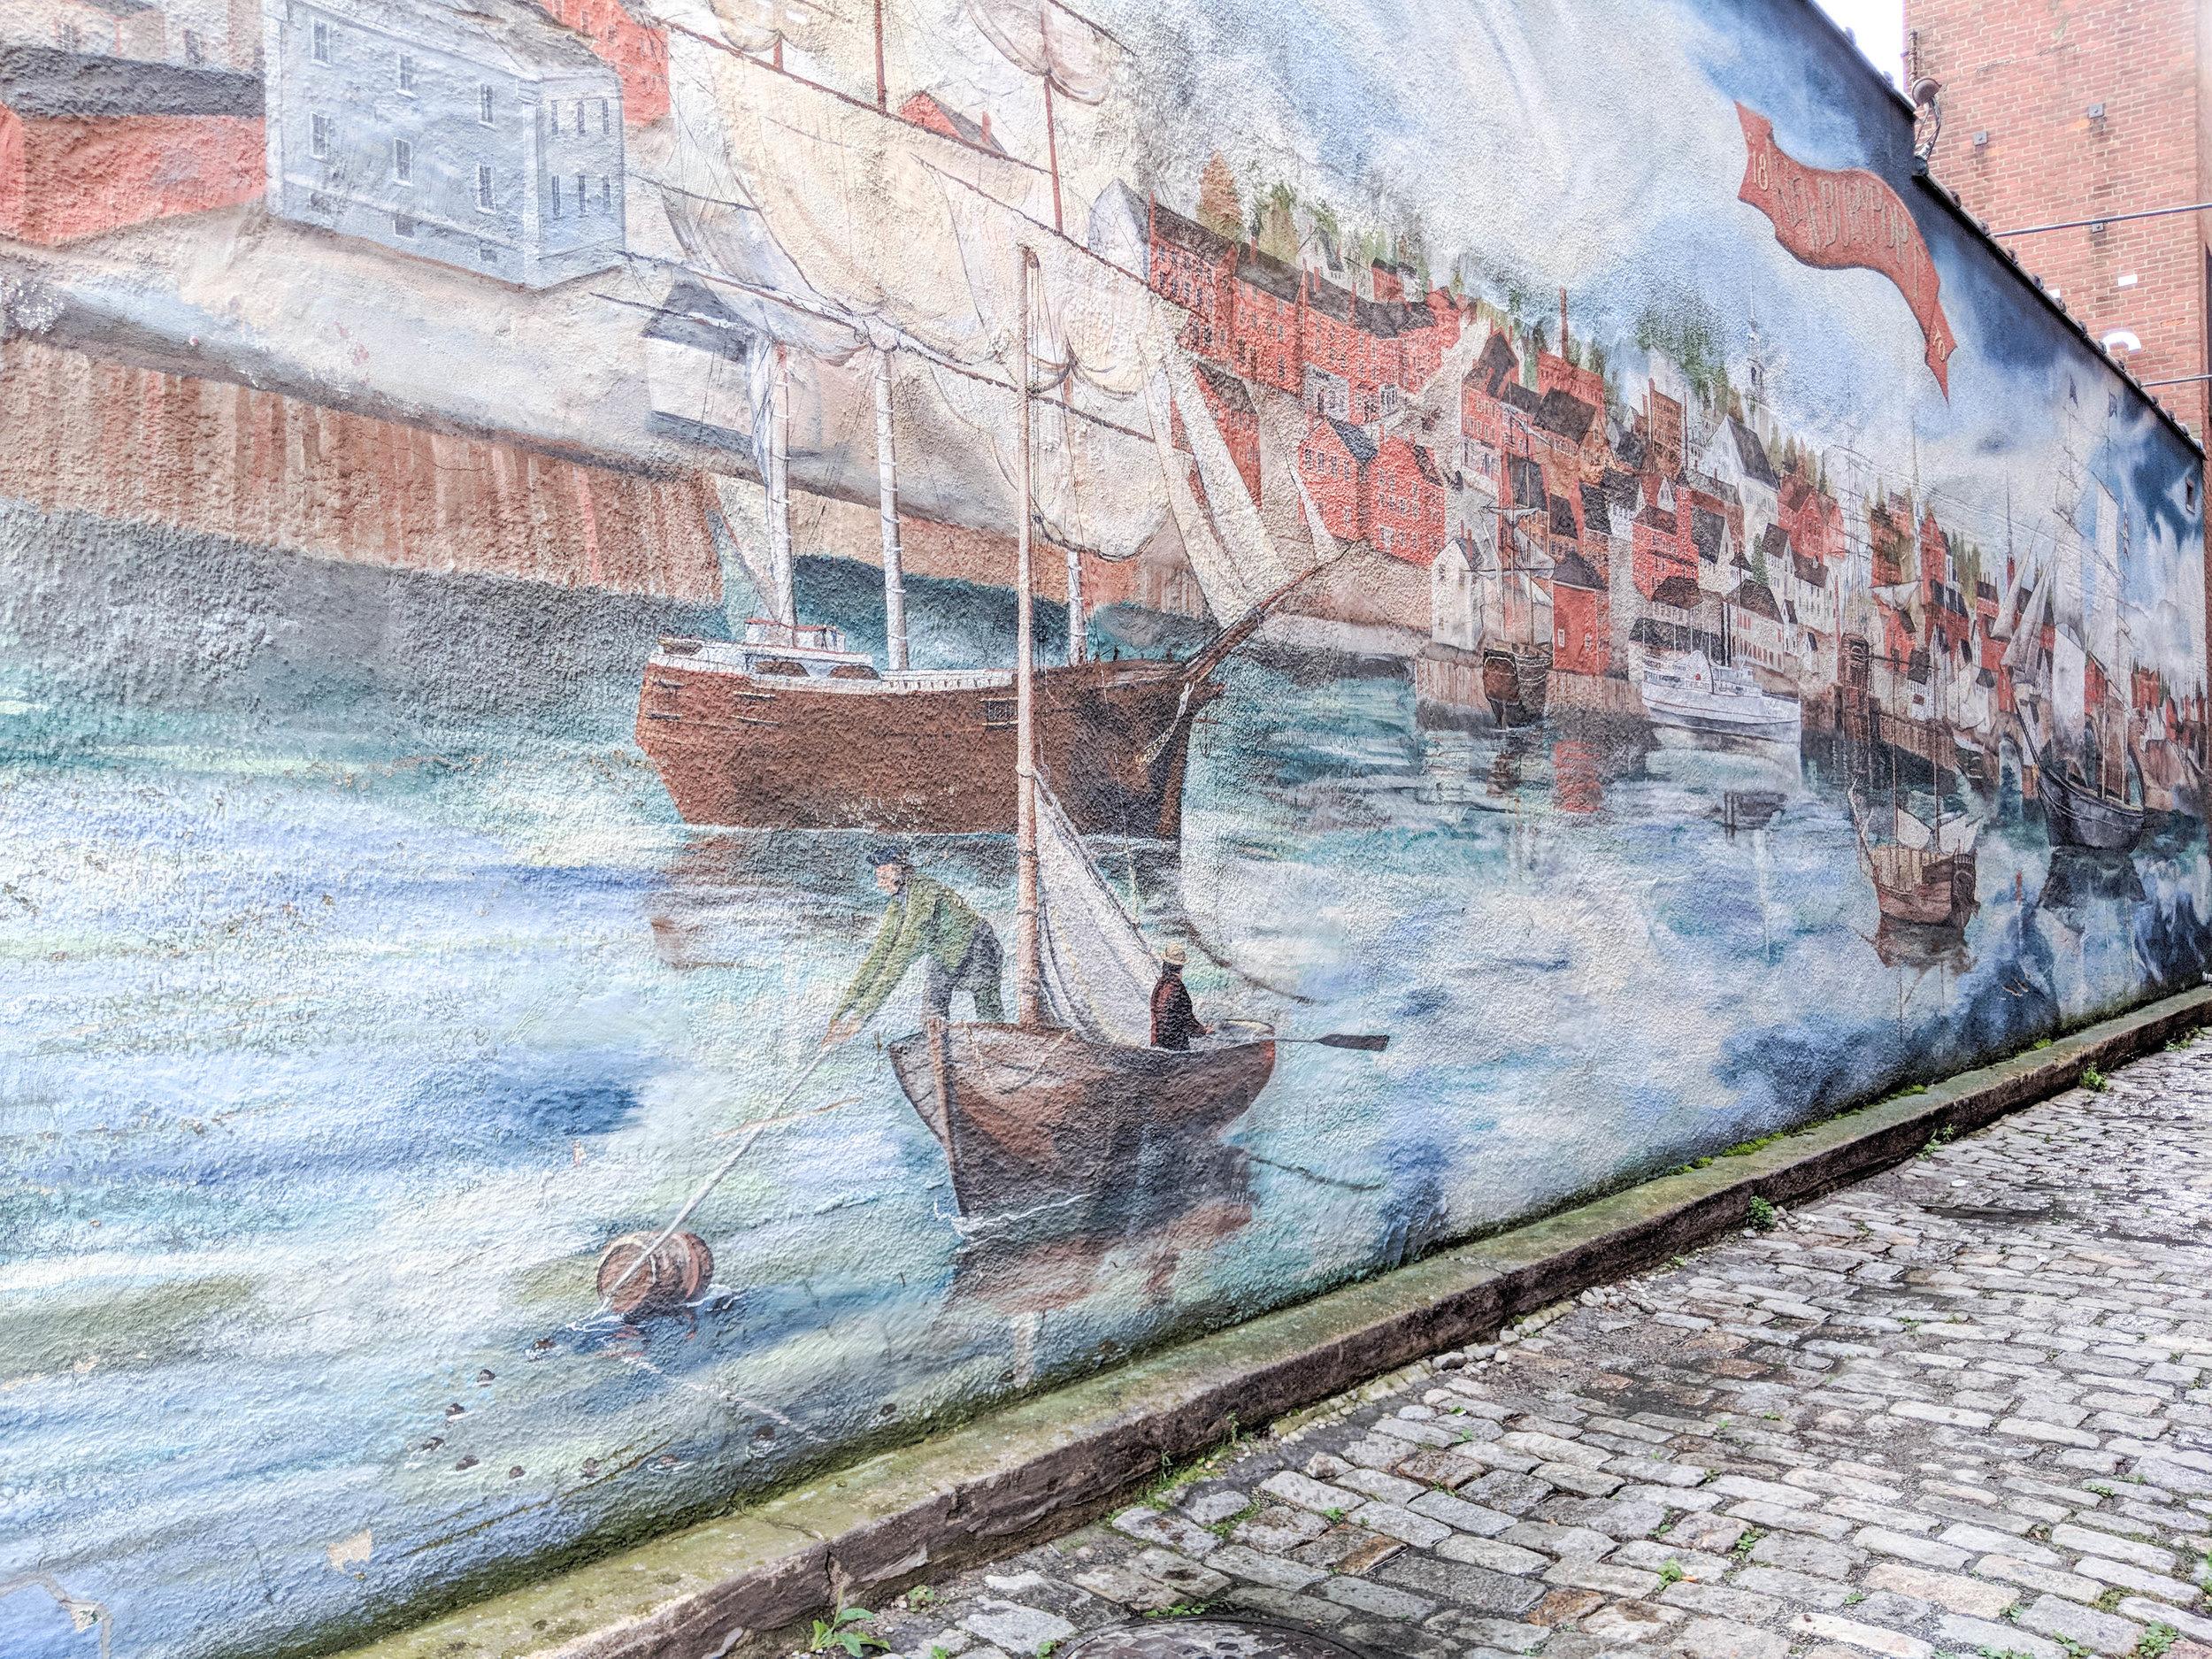 bri rinehart; newburyport; mural